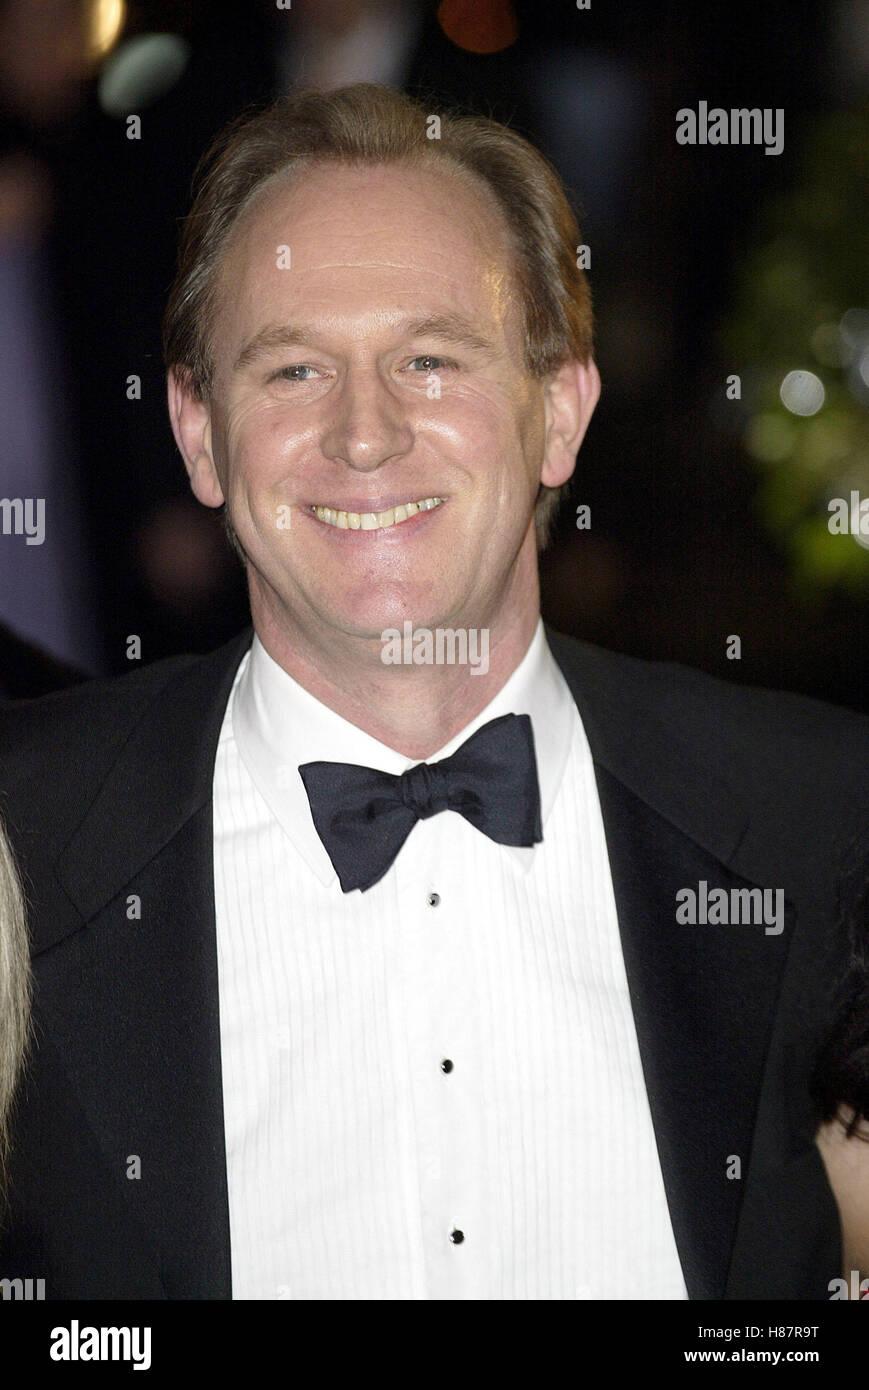 Peter Davison (born 1951)